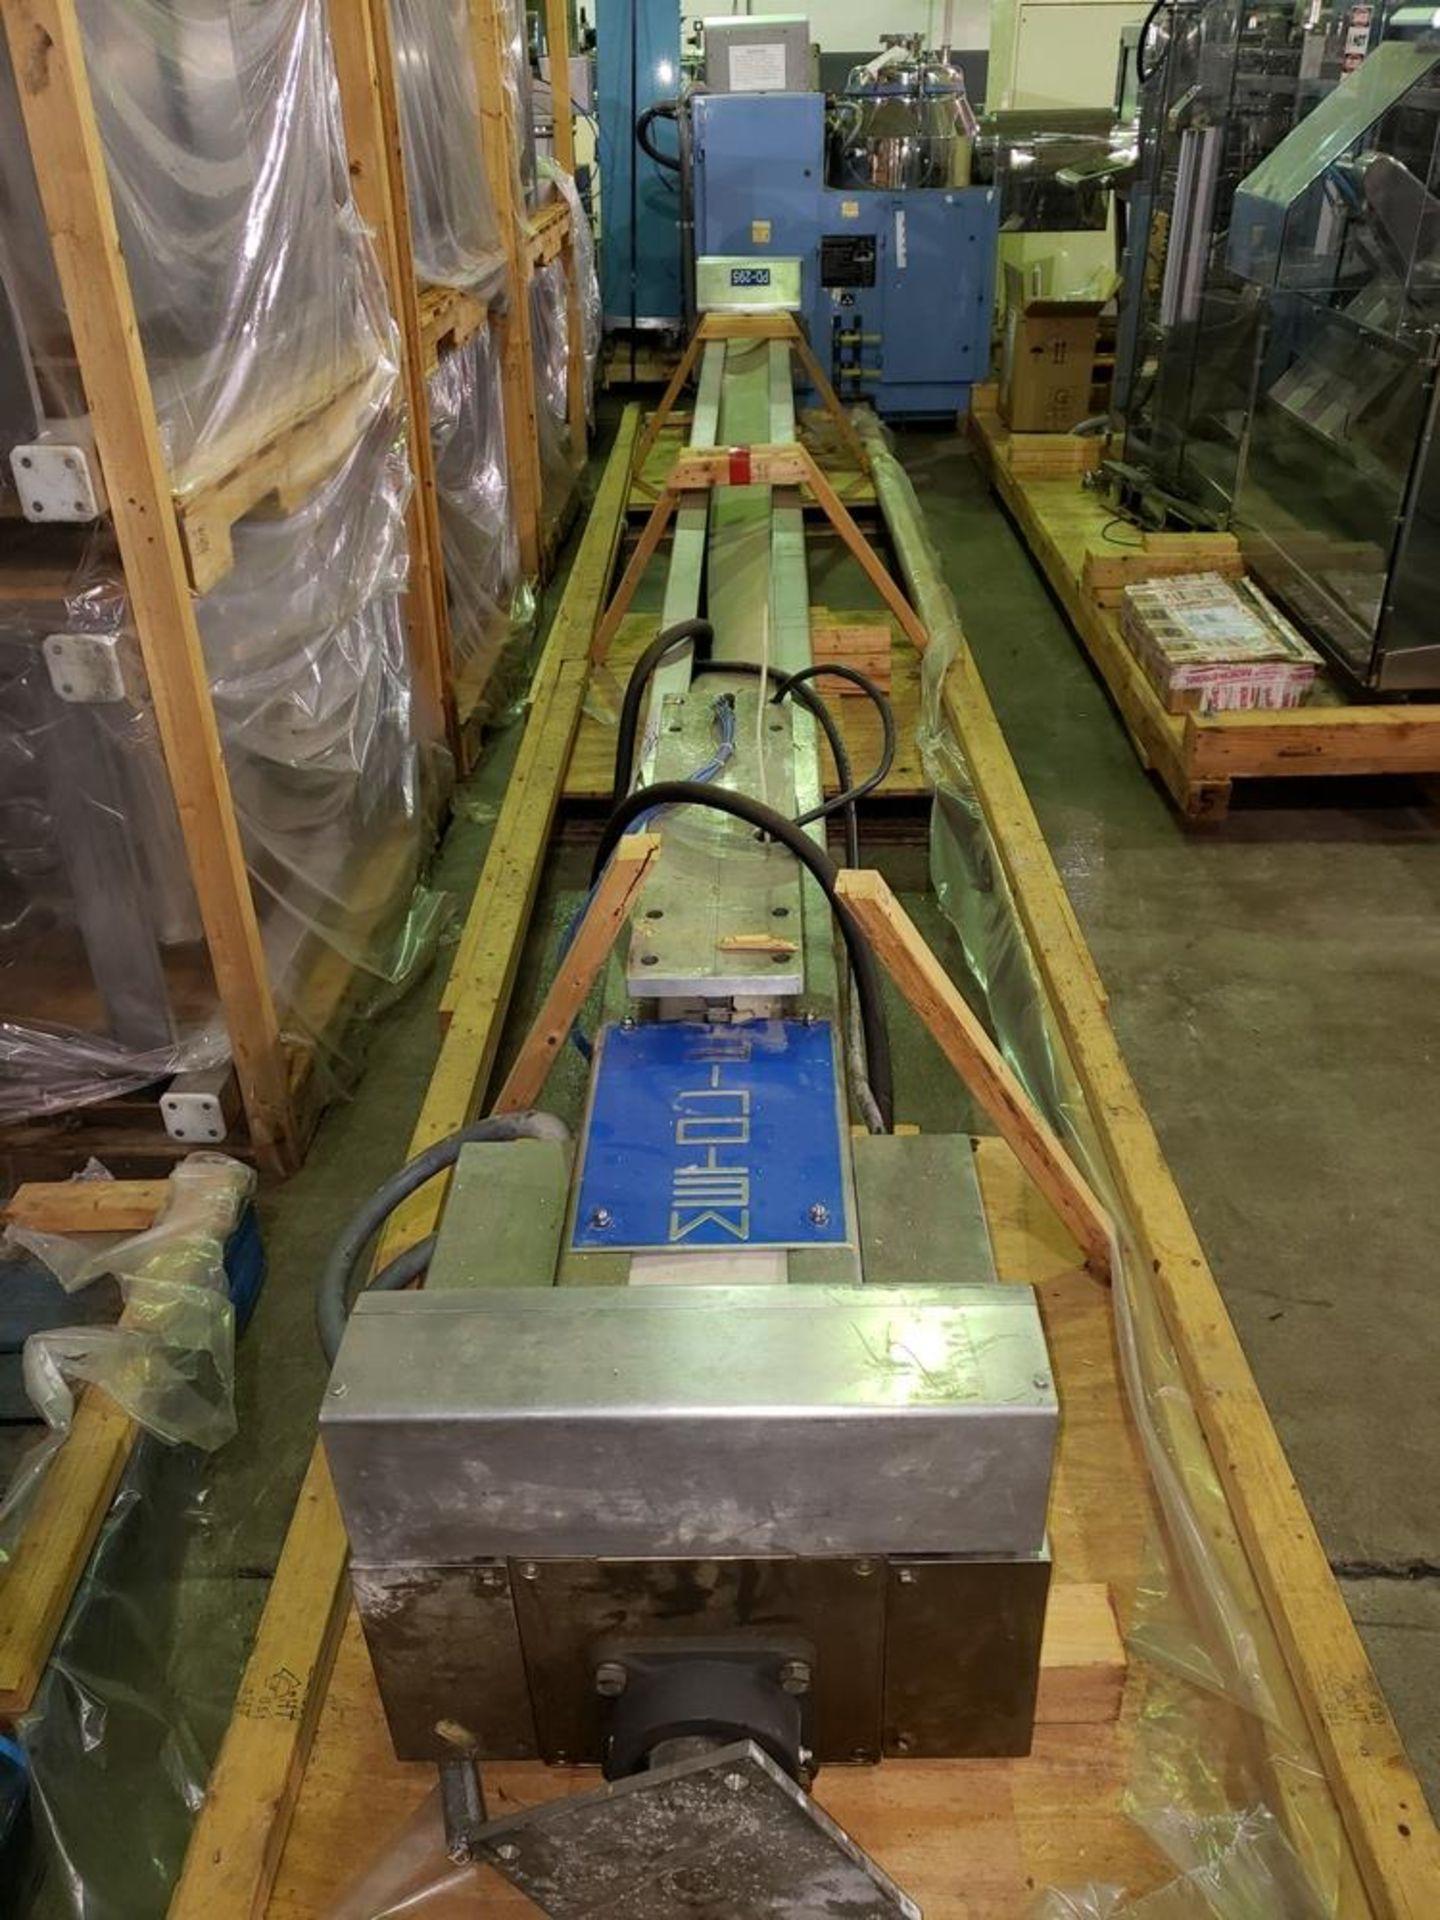 "Lot 59 - Metolift colum lifter/blender, model CBS-200-S, stainless steel construction, 154"" max. lift"